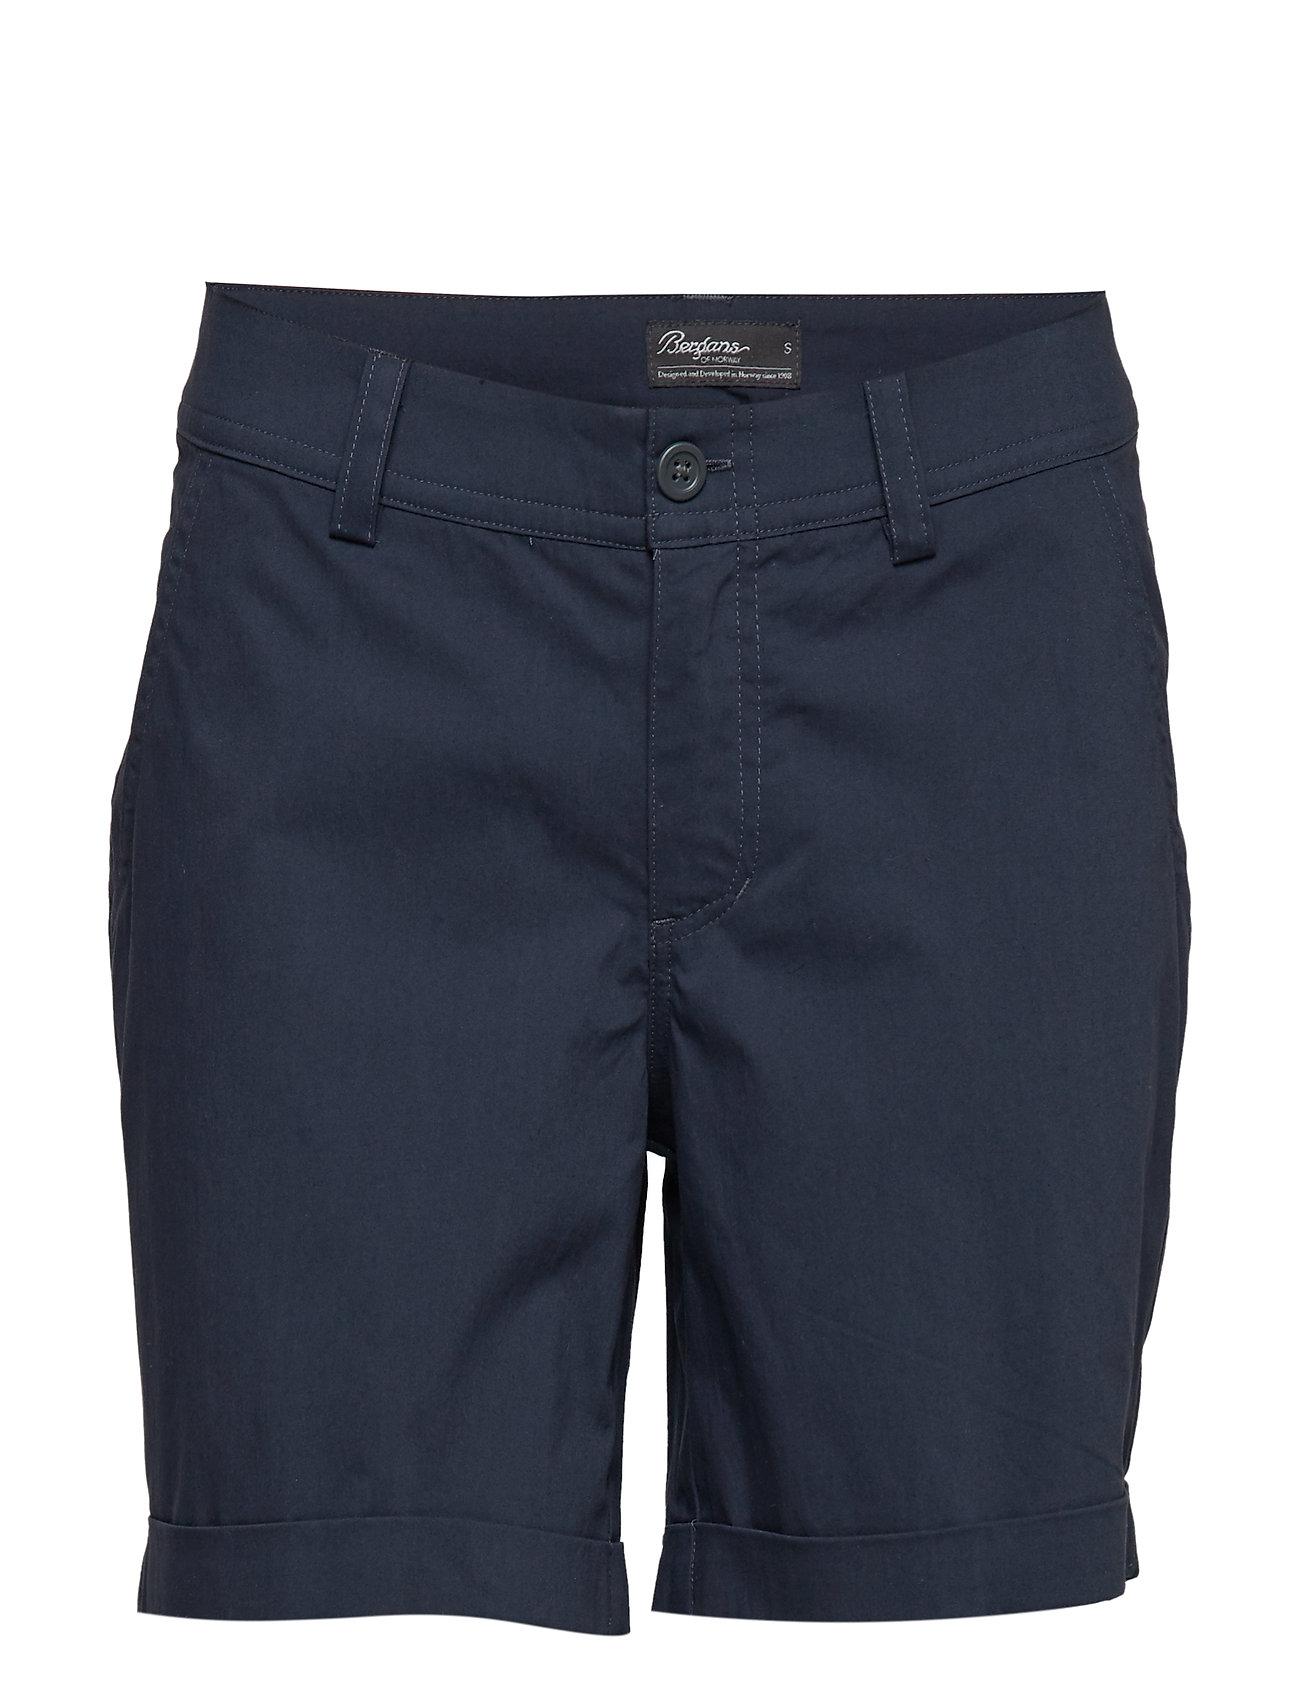 Bergans Oslo W Shorts - DK NAVY